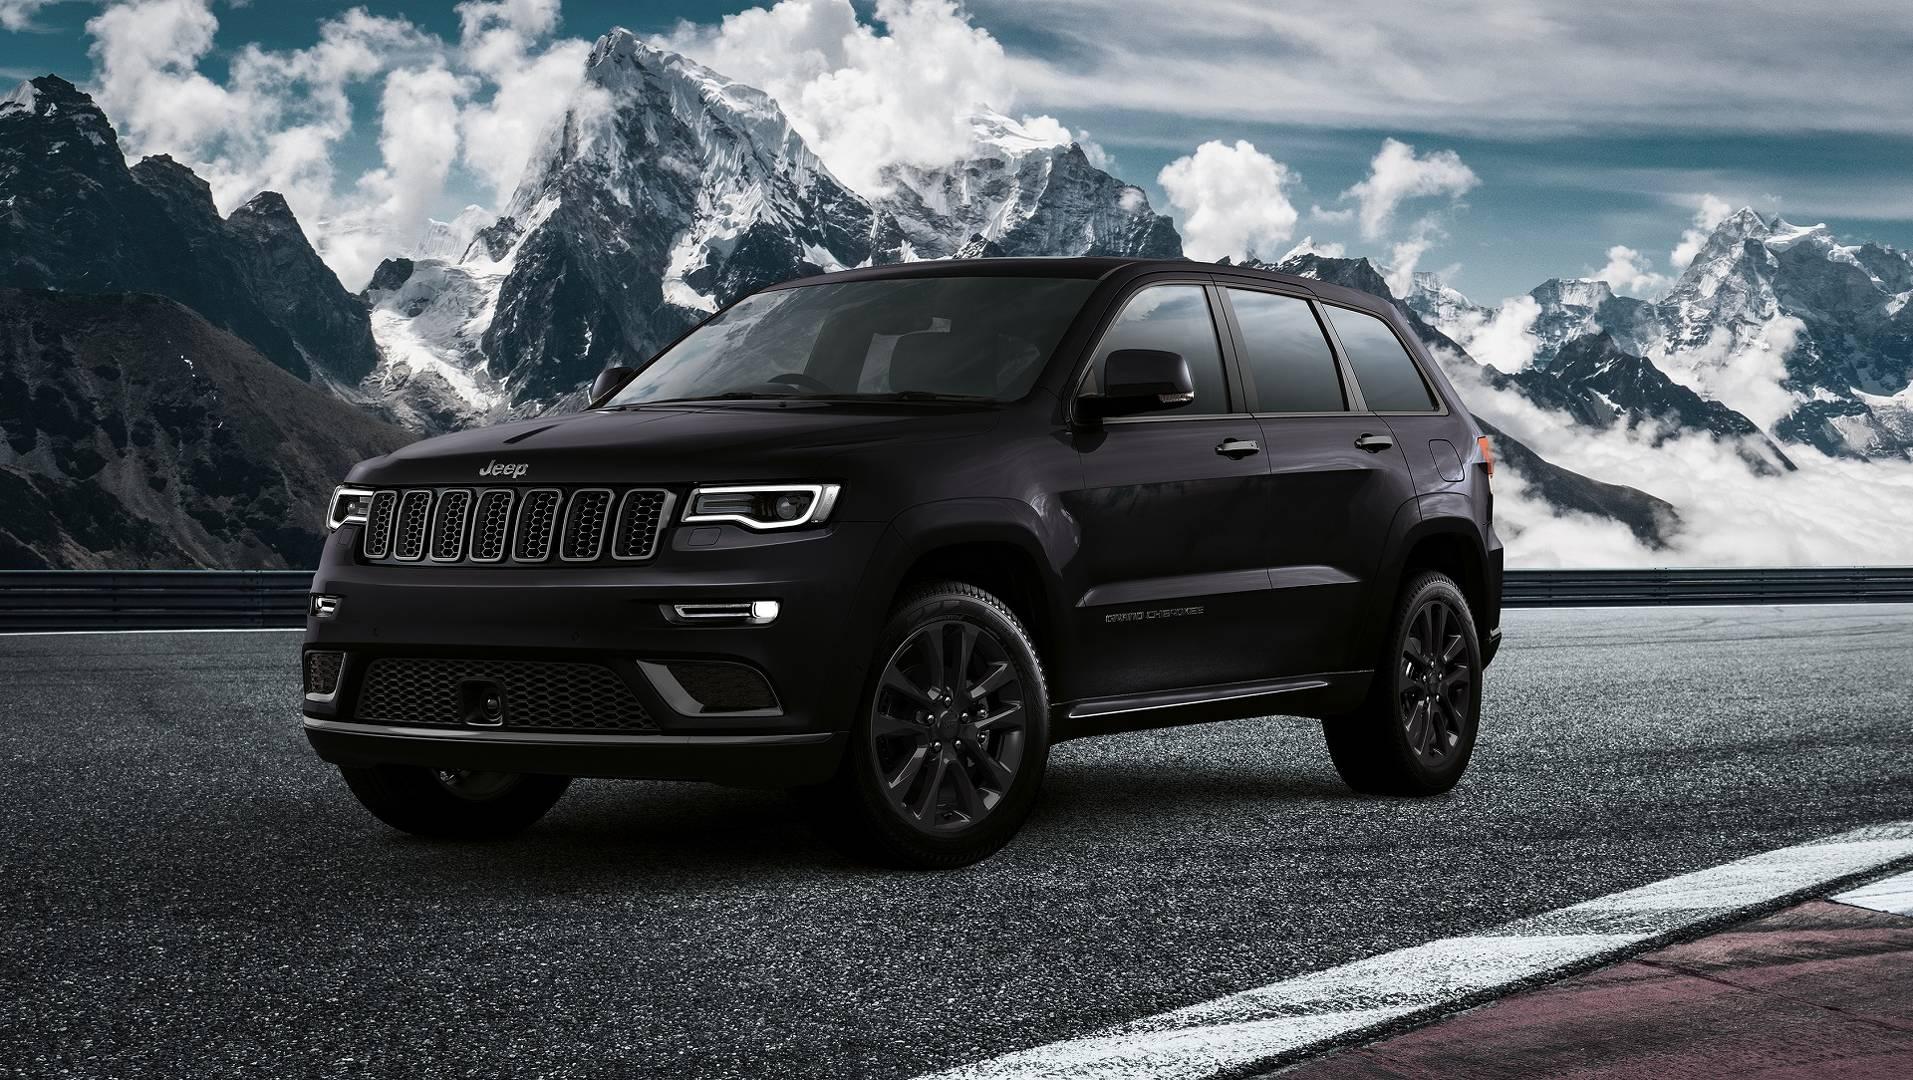 Jeep представил спортивную версию джипа Grand Cherokee